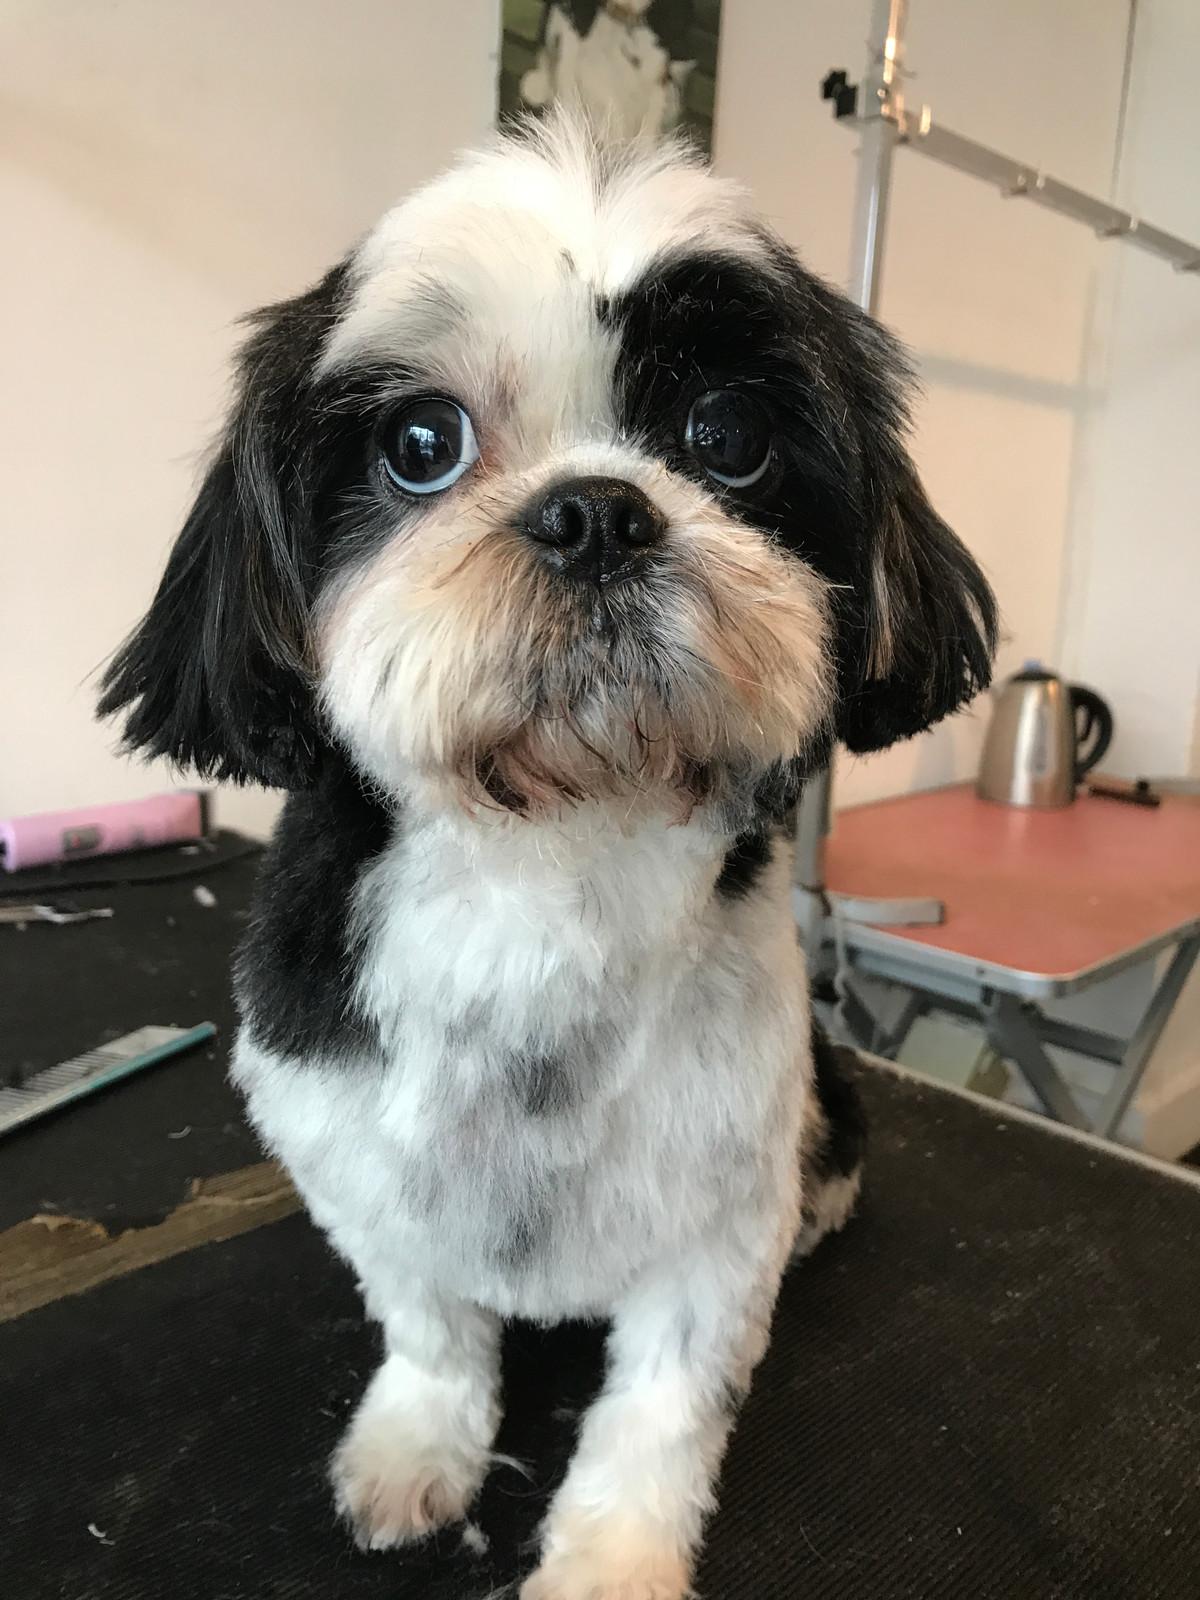 Img1022g Dogmatics Fur Grooming Styles Luxury Dog Groomers